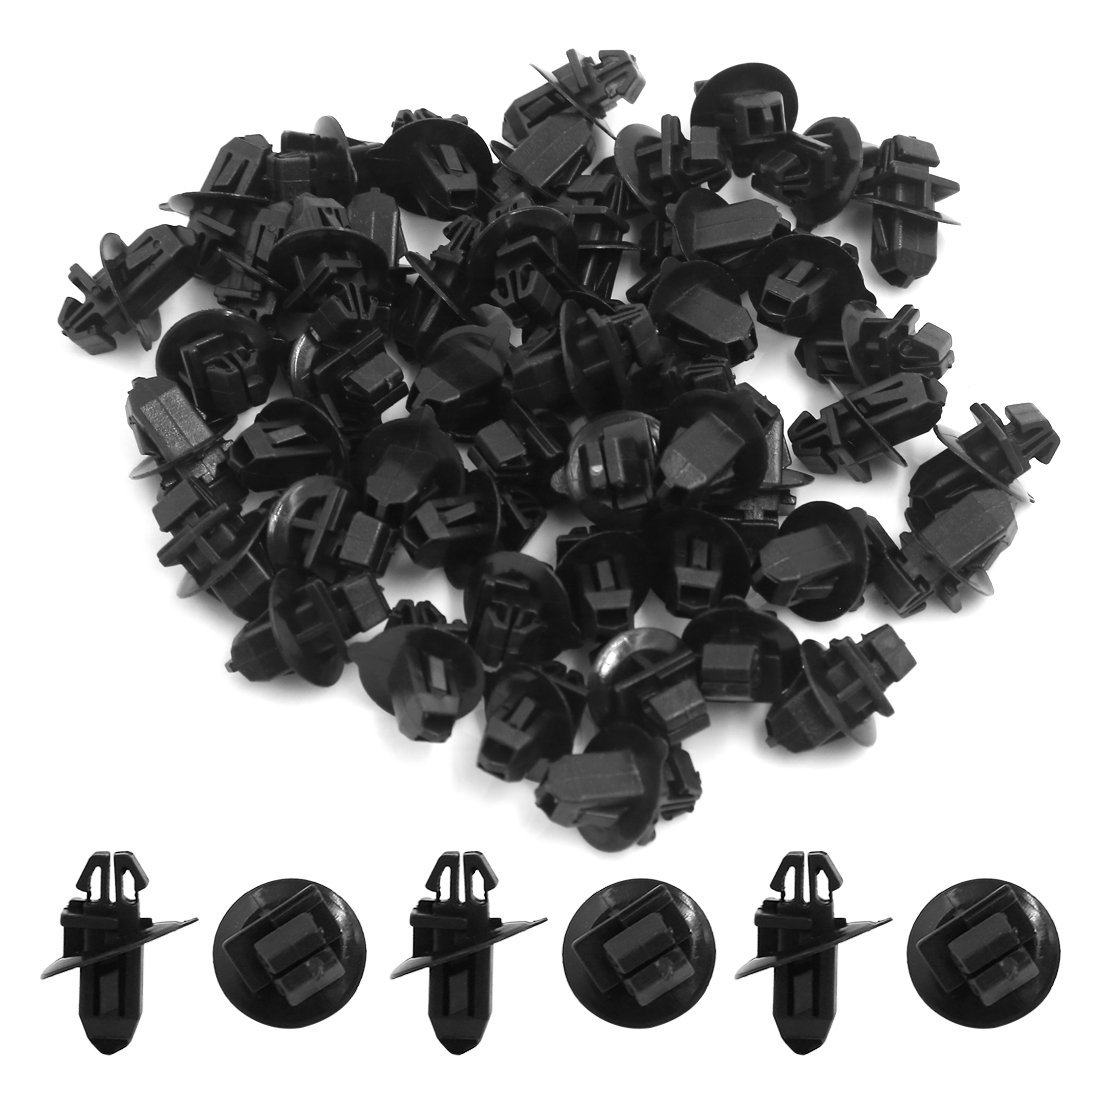 Amazon.com: eDealMax 50 PC Negro 11 mm Diámetro del orificio de plástico Protección Contra salpicaduras de moldeo pegatina Clips Para coches: Automotive